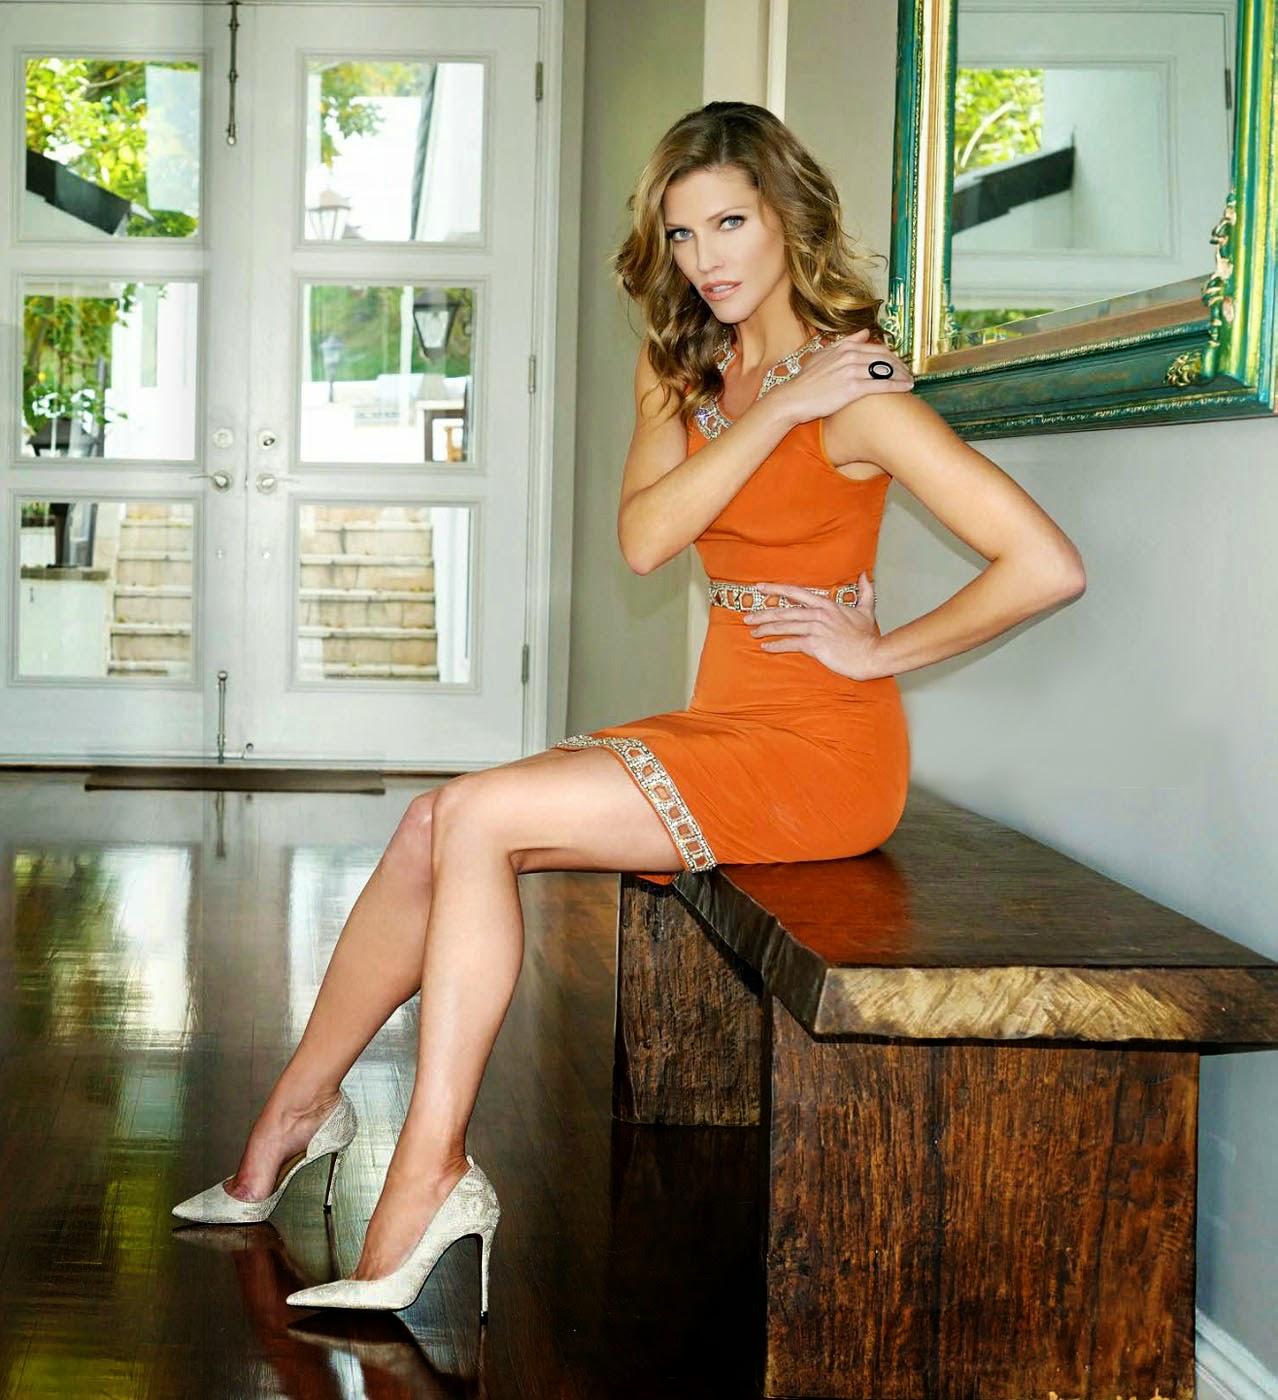 Tricia Helfer hot legs in high heels